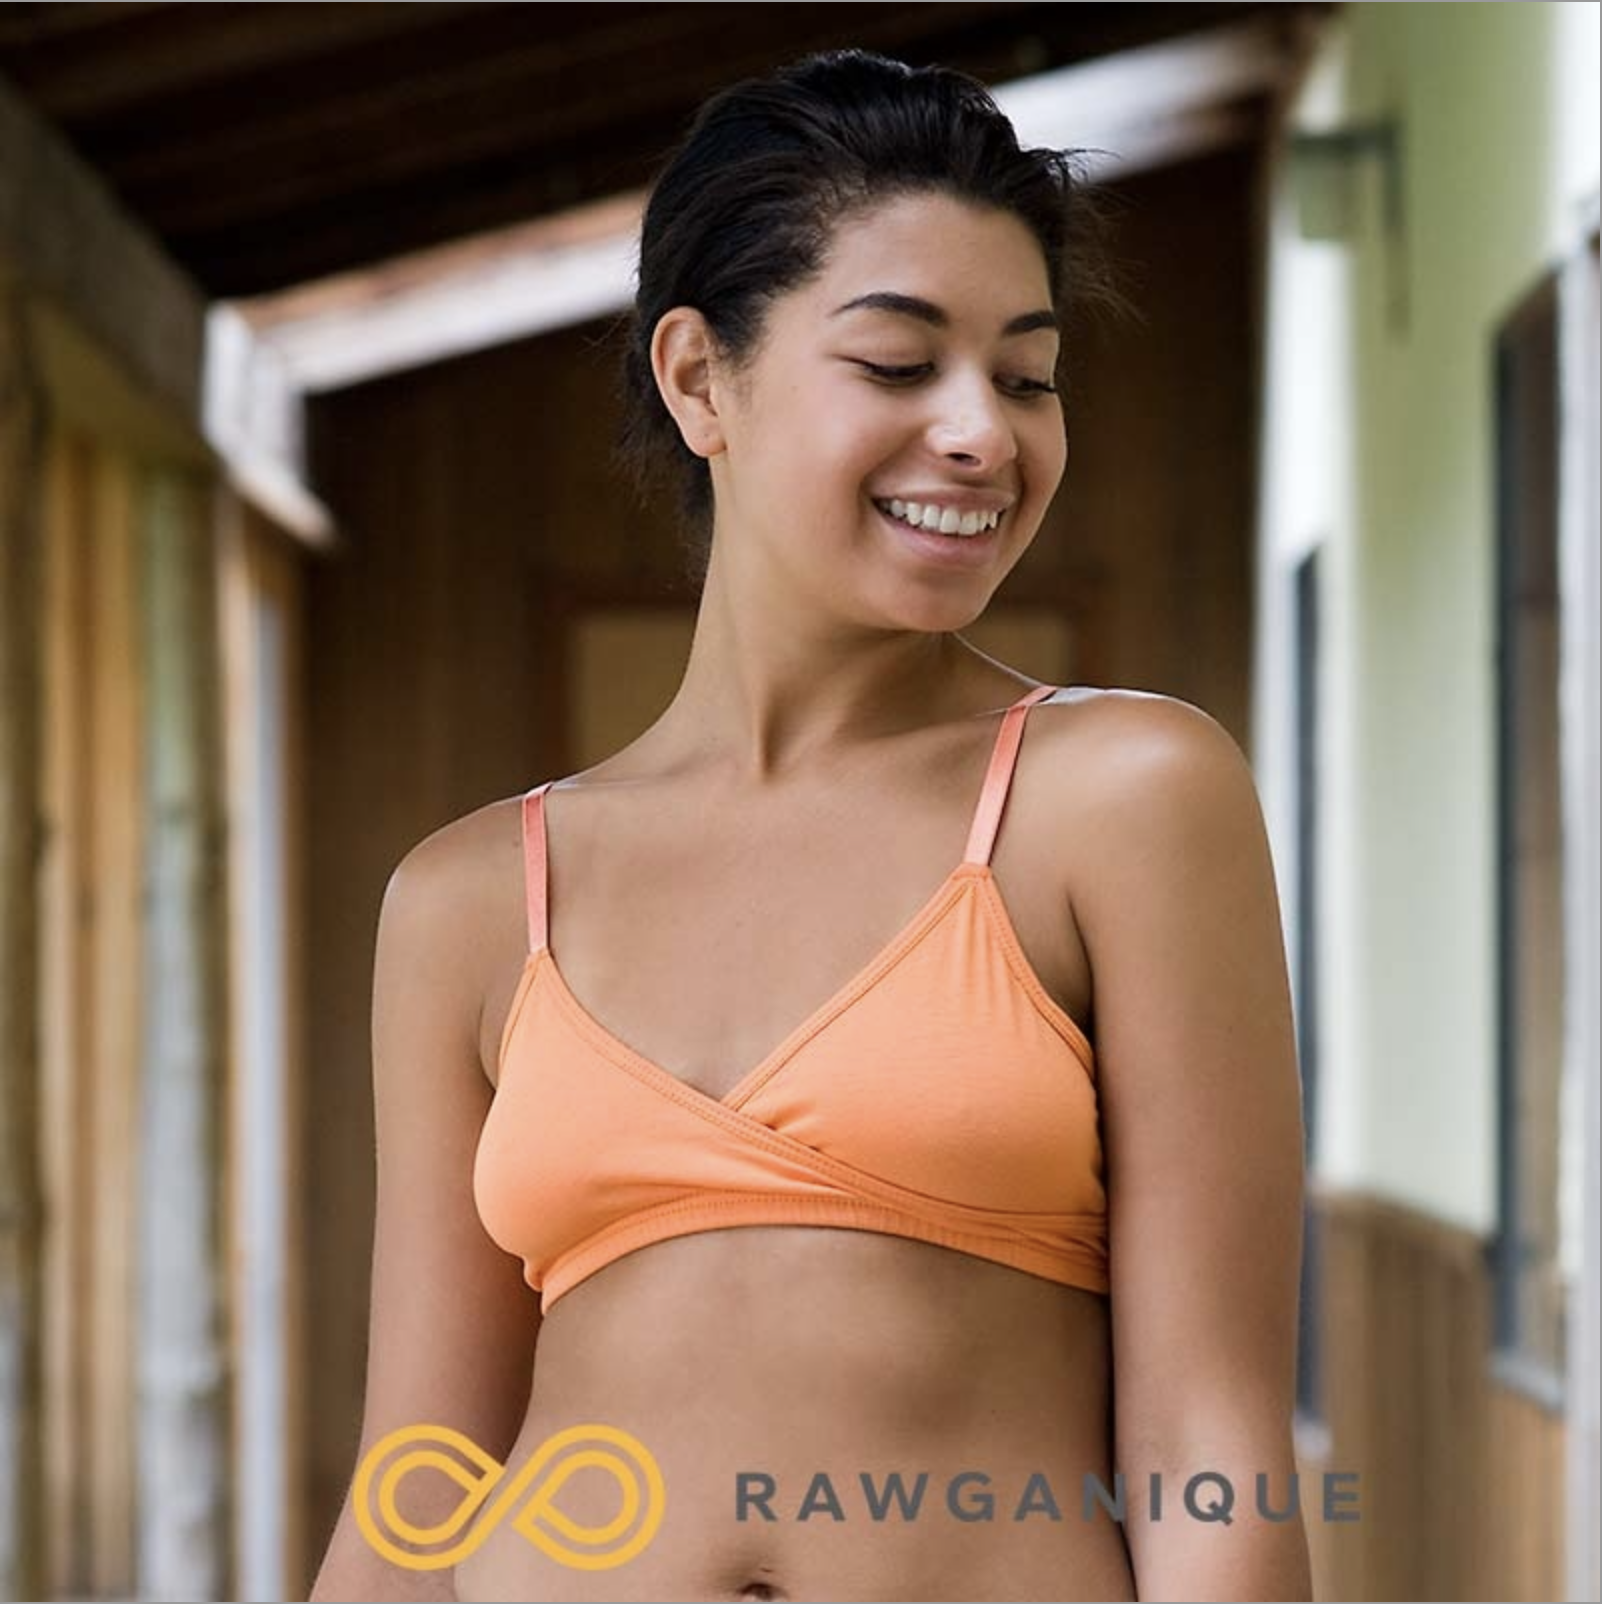 Organic cotton contour bra with adjustable straps